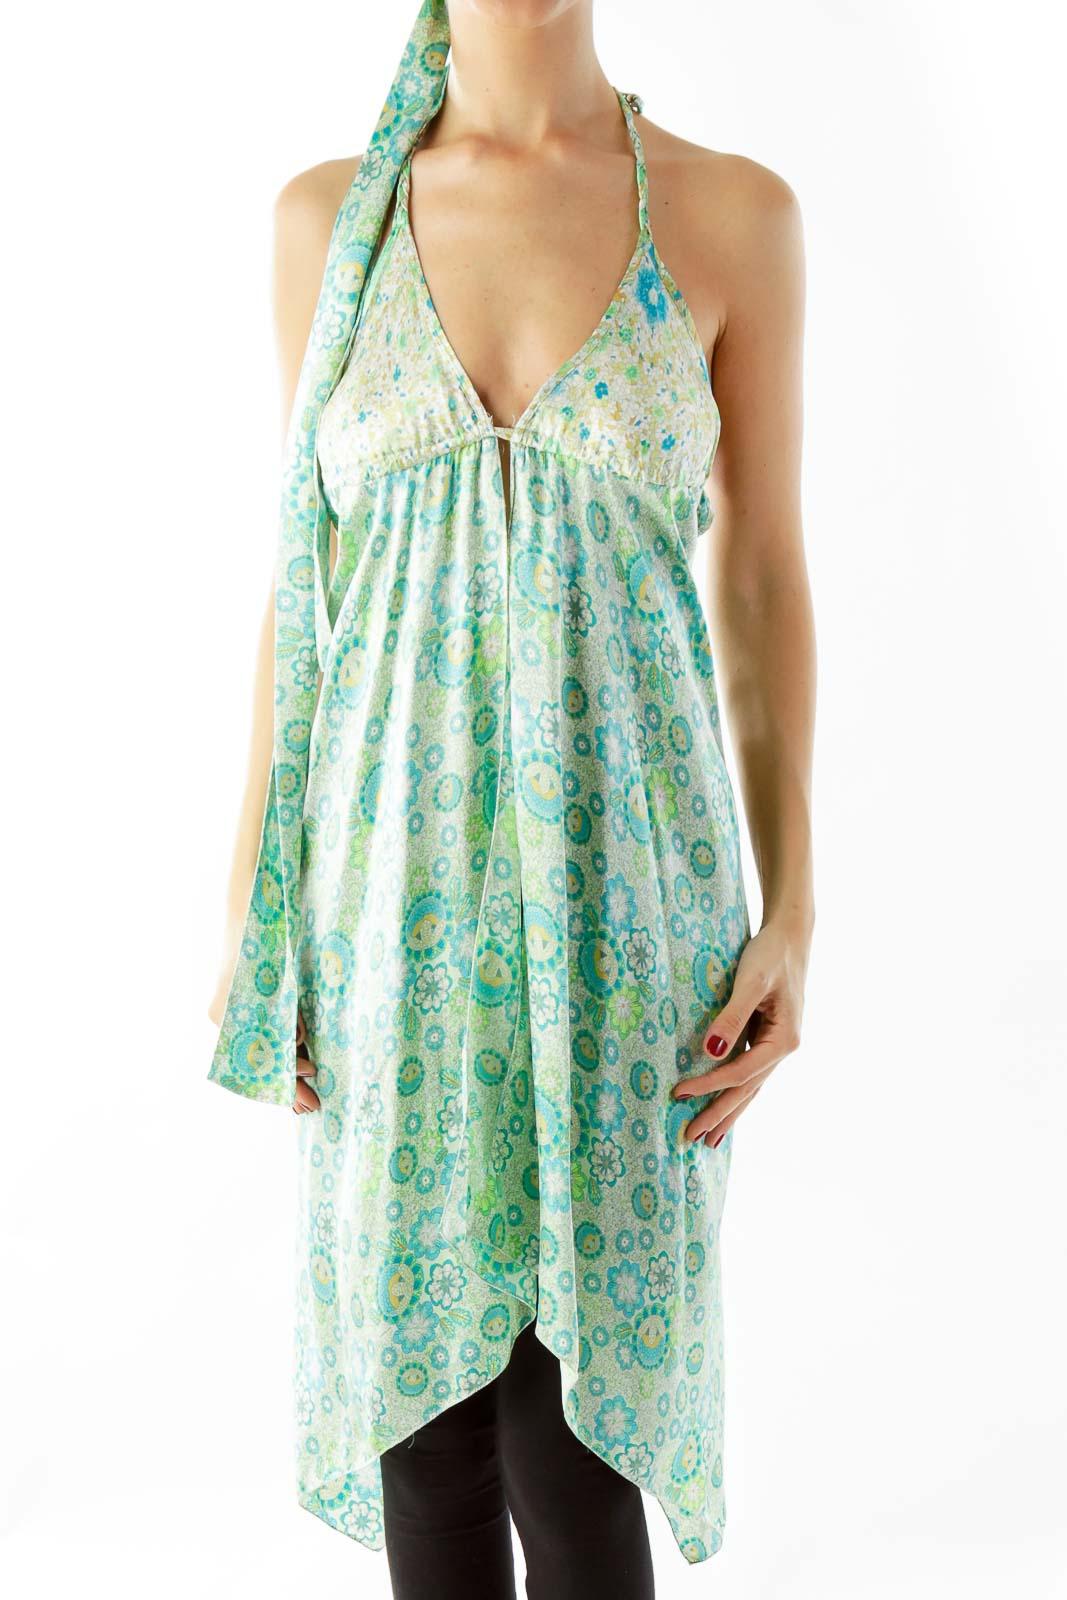 Blue Green Floral Dress Front